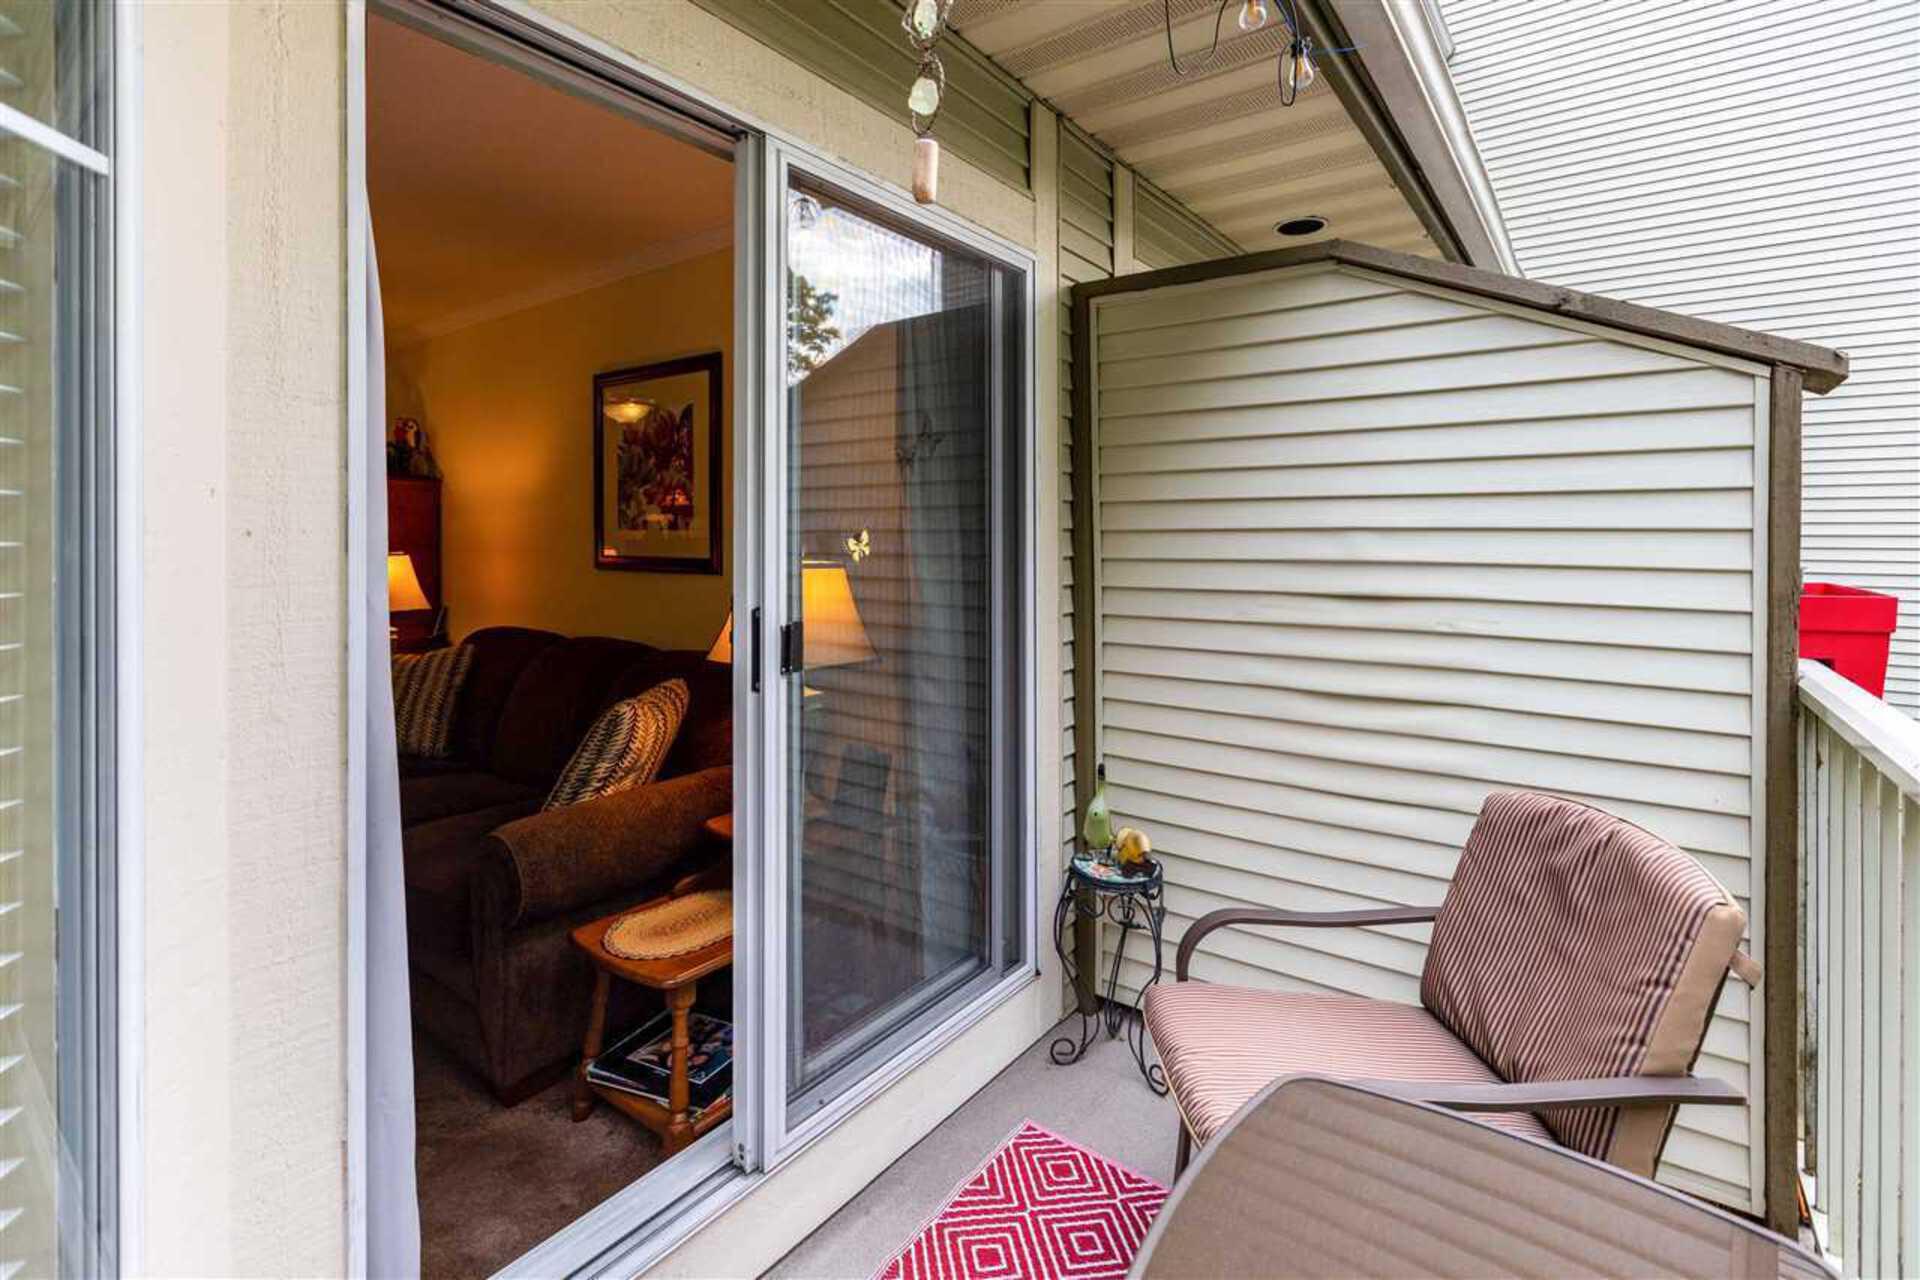 1318-brunette-avenue-maillardville-coquitlam-10 of 1 - 1318 Brunette Avenue, Maillardville, Coquitlam